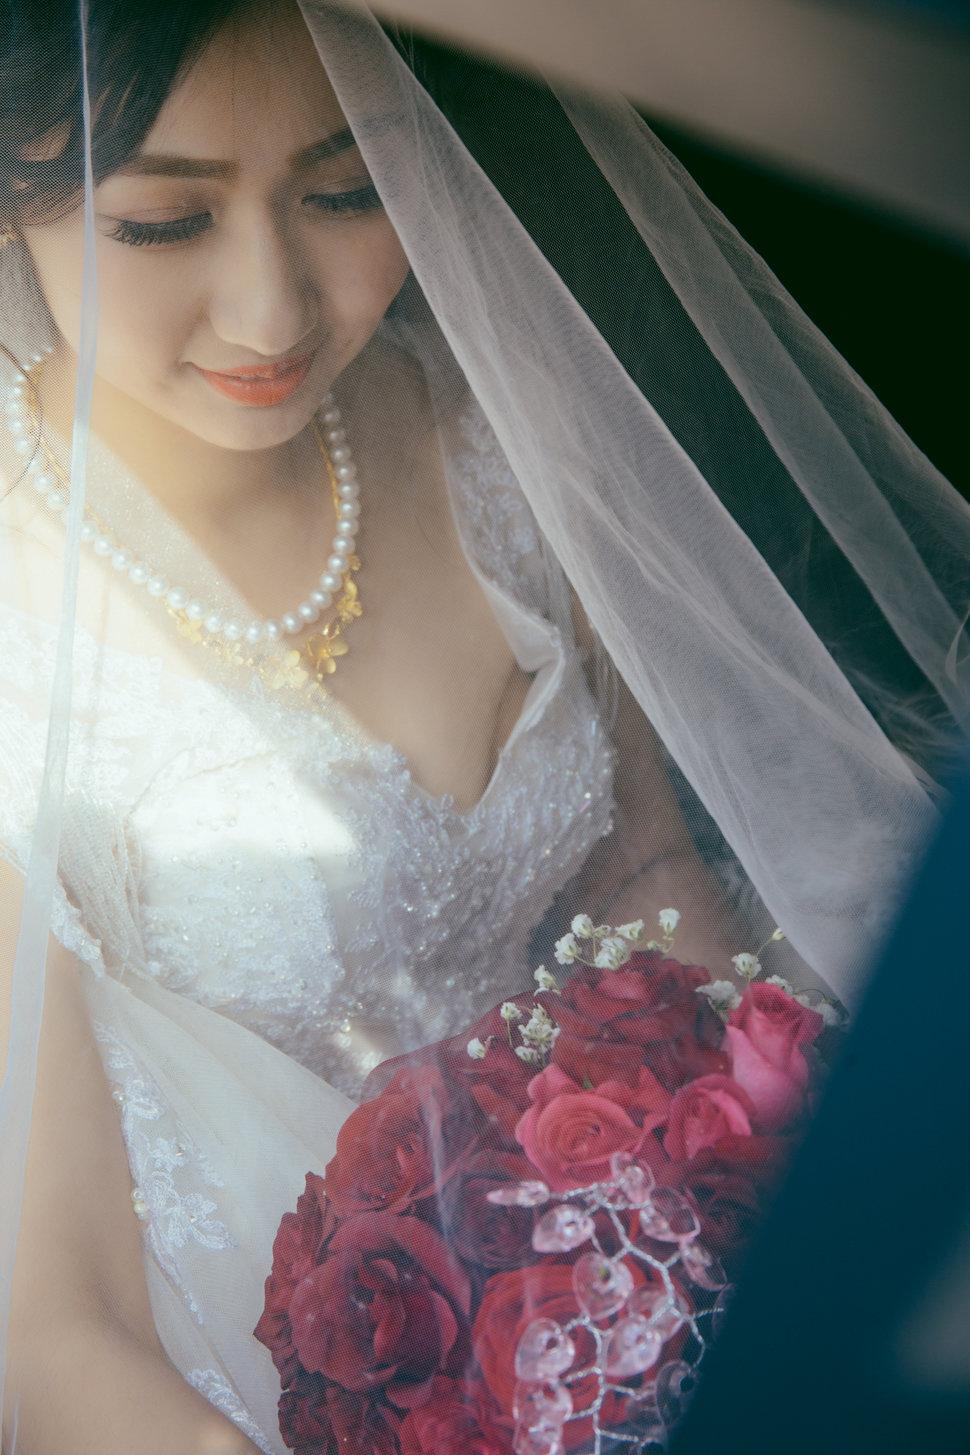 HAO_9839 - J.H Photography維納斯婚禮 - 結婚吧